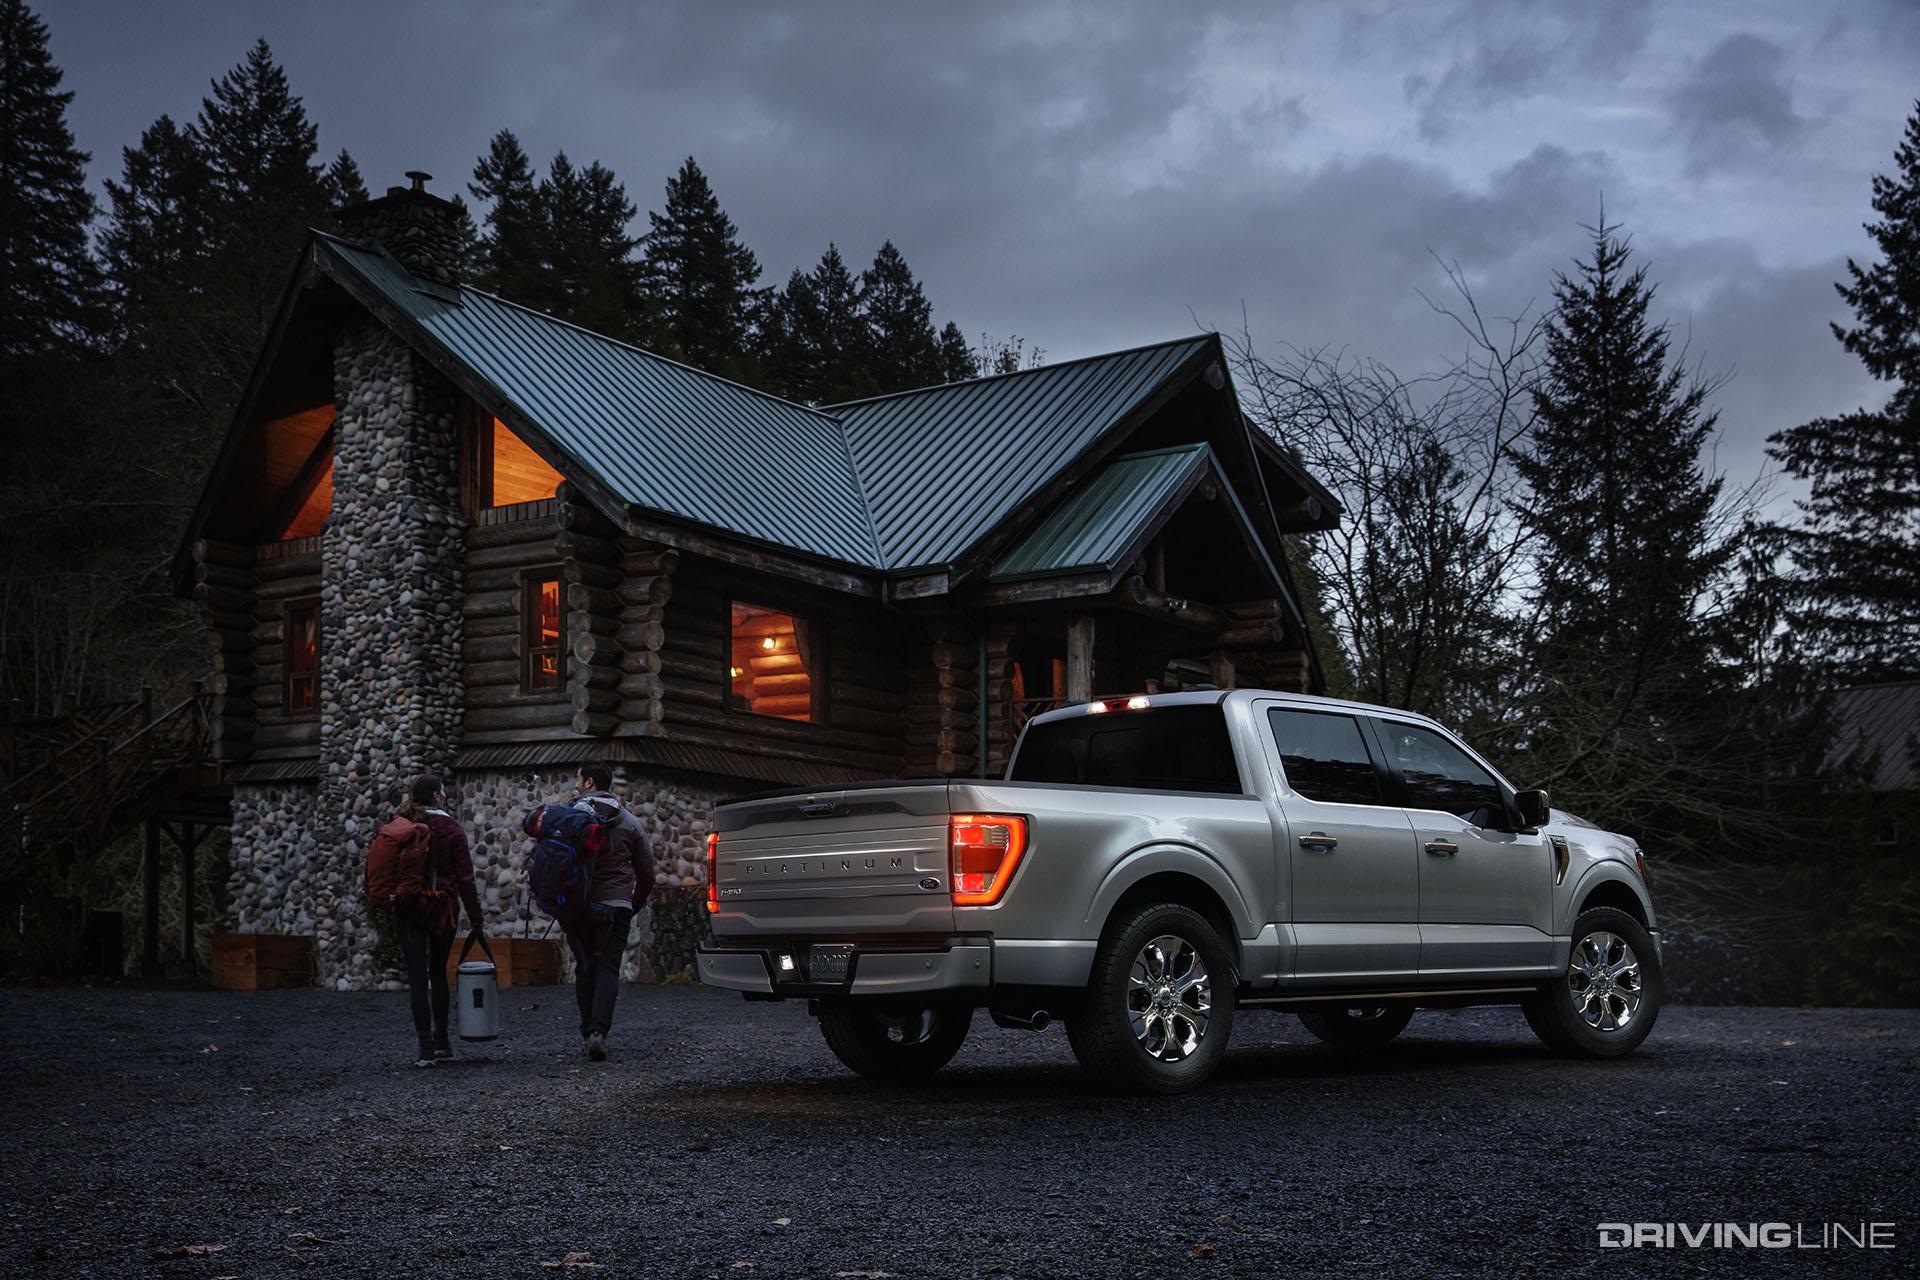 Turbo, Diesel, V8 or Hybrid: The New 2021 Ford F-150 Truck ...